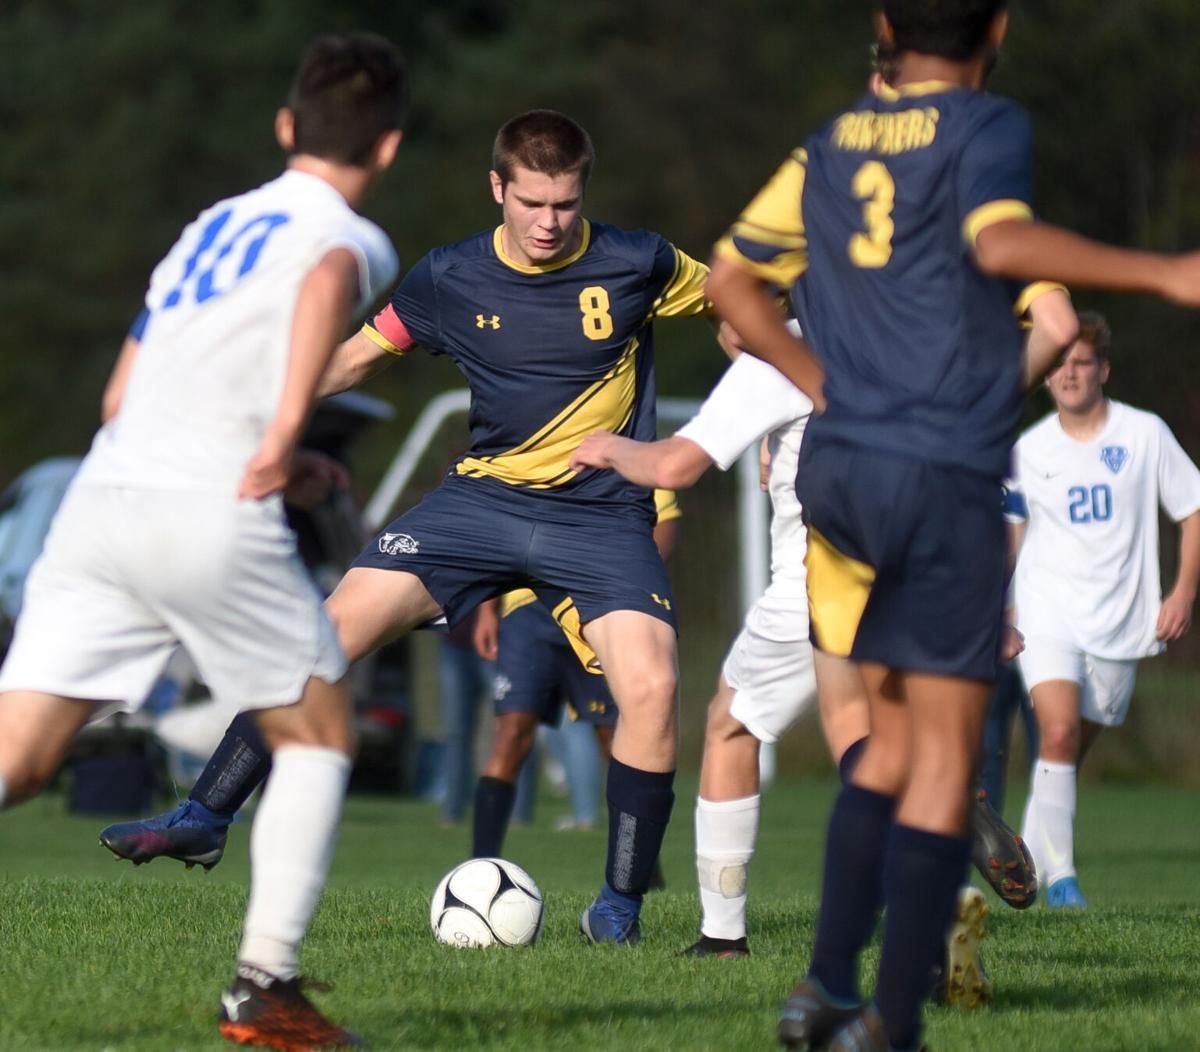 Boys Soccer - Saegertown vs. Seneca